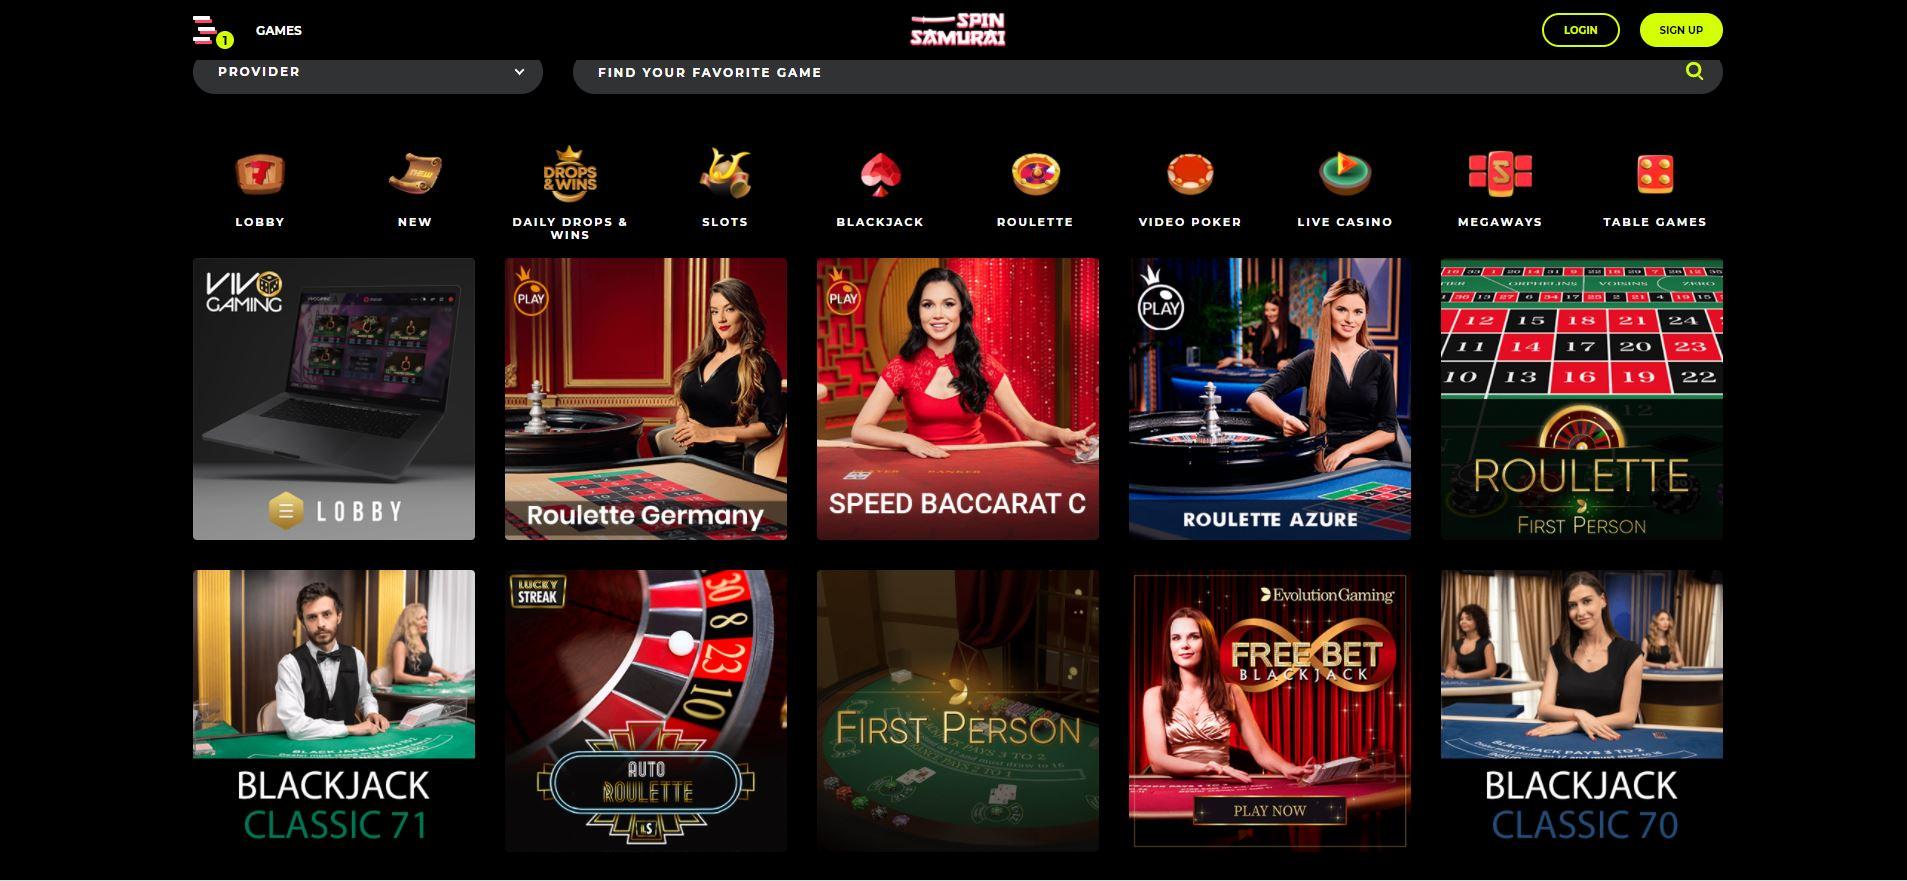 Spin Samurai Live Casino Screenshot